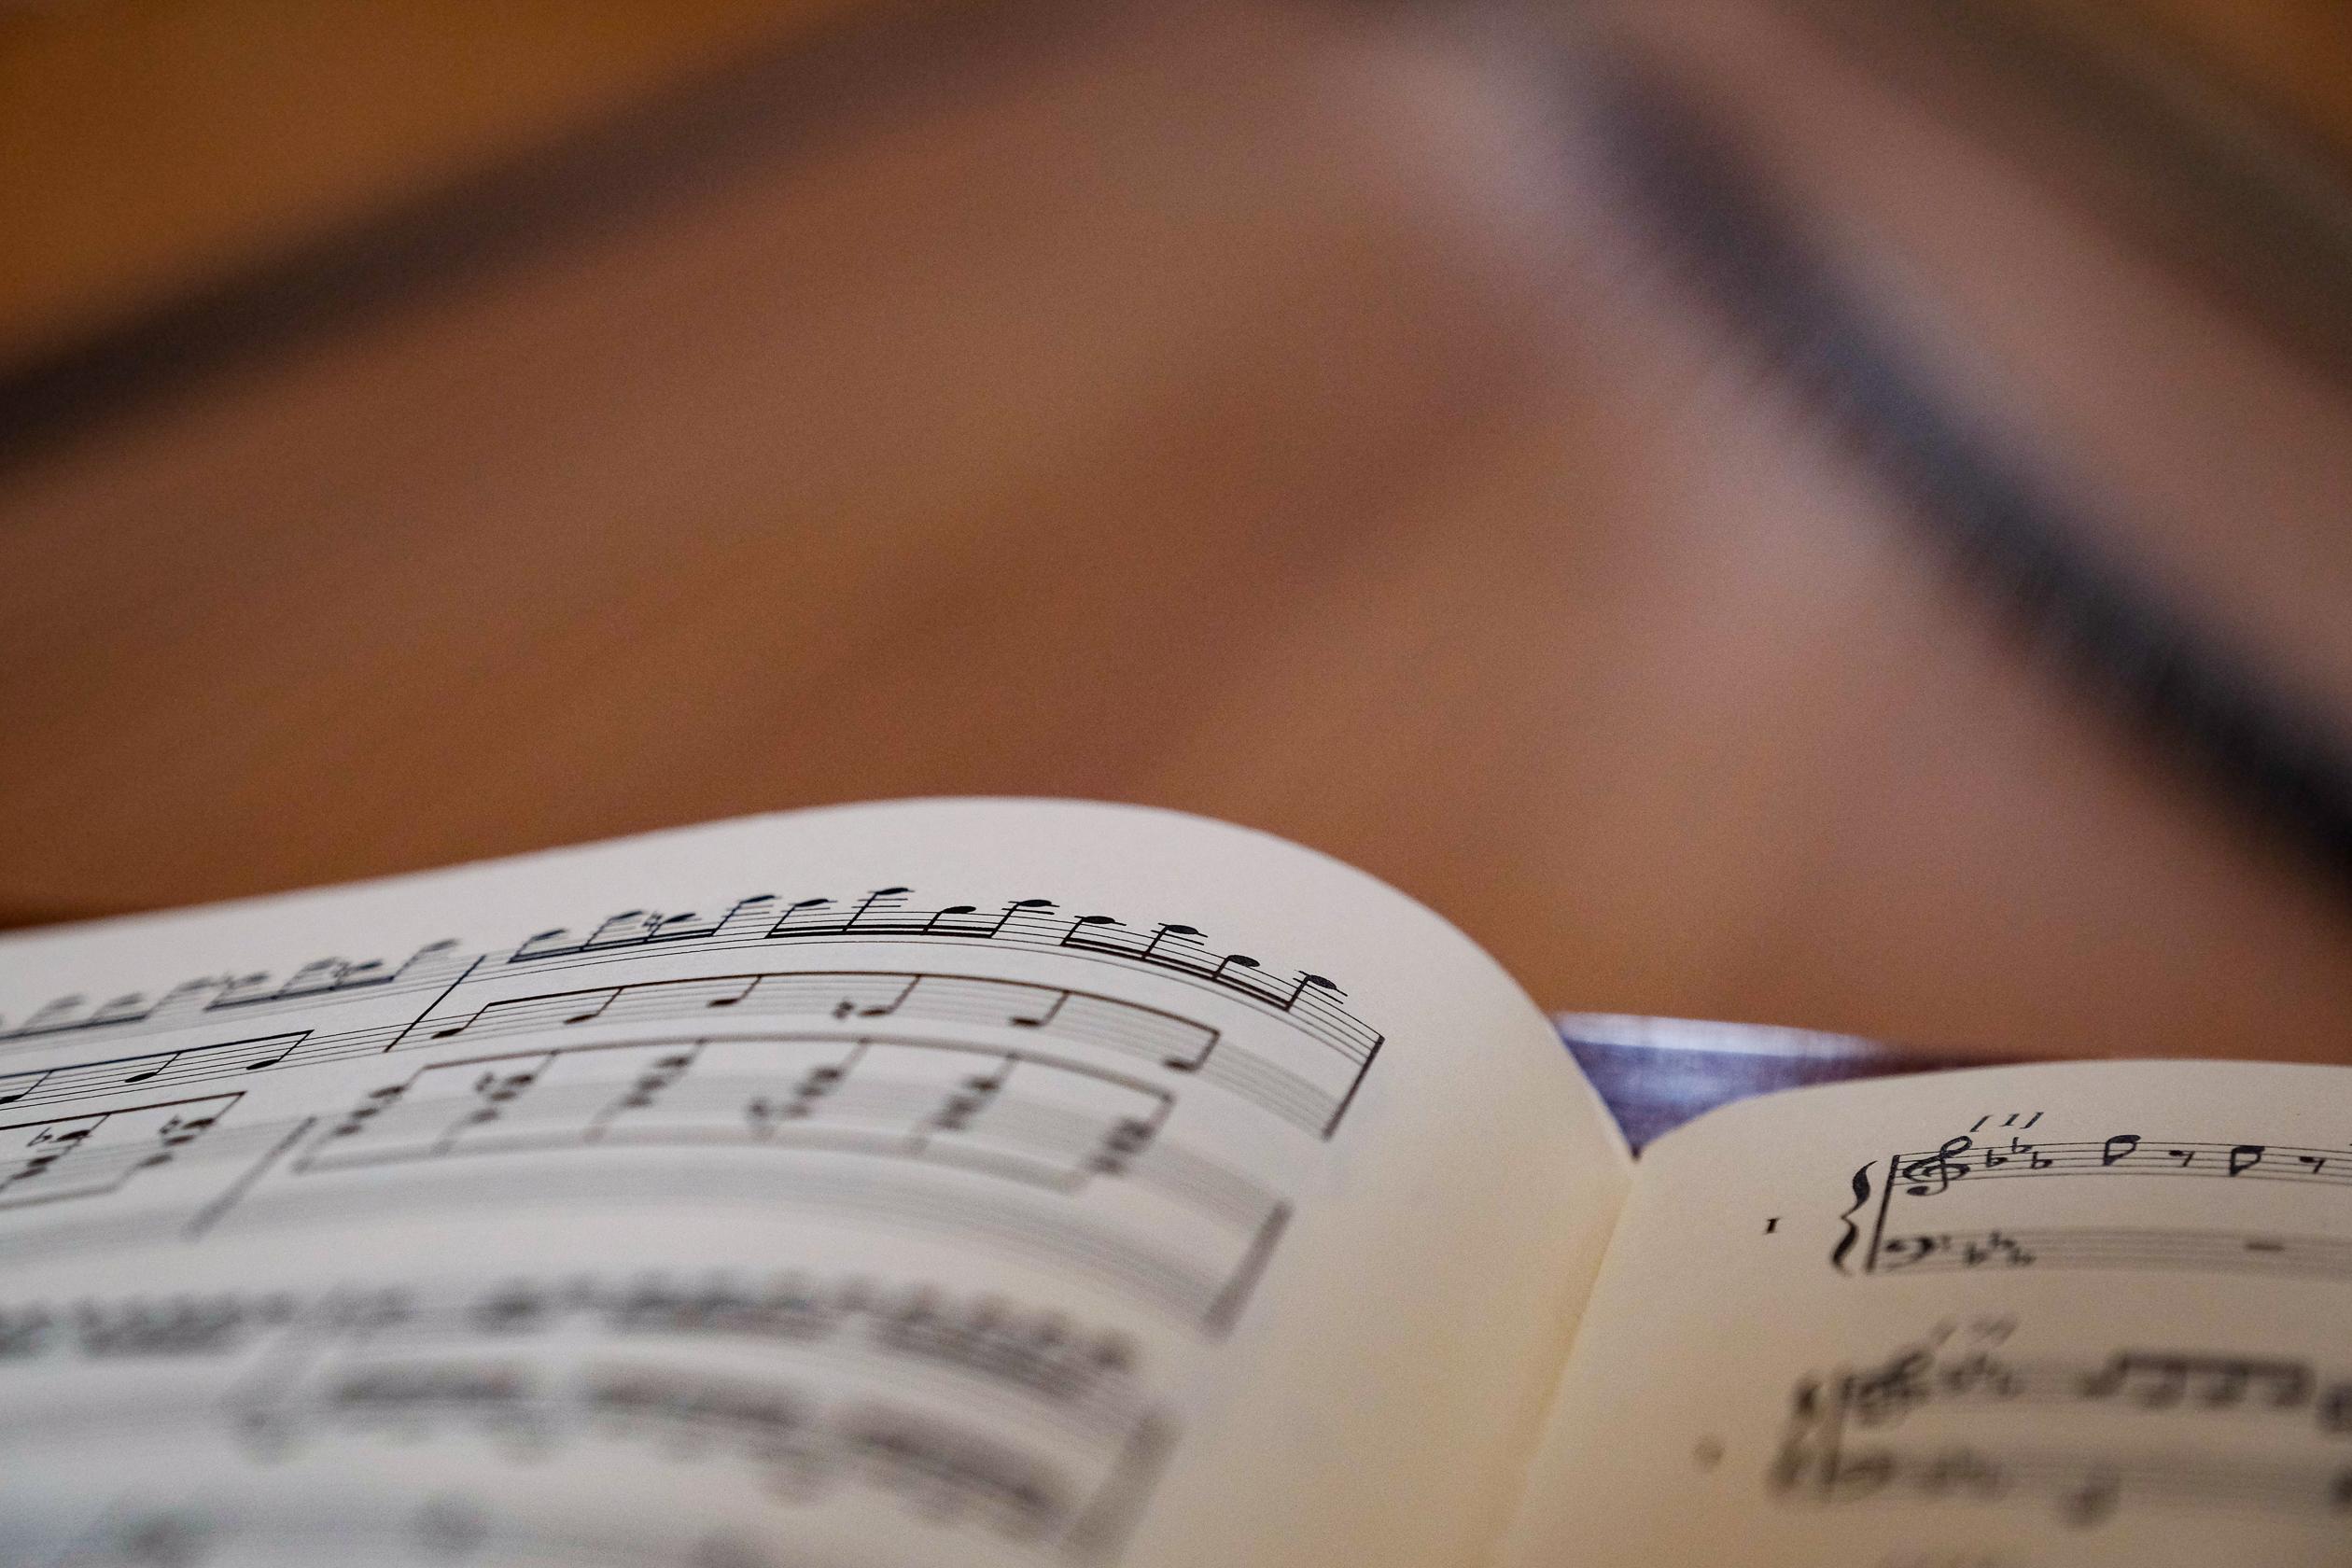 Haydneum - publikációk